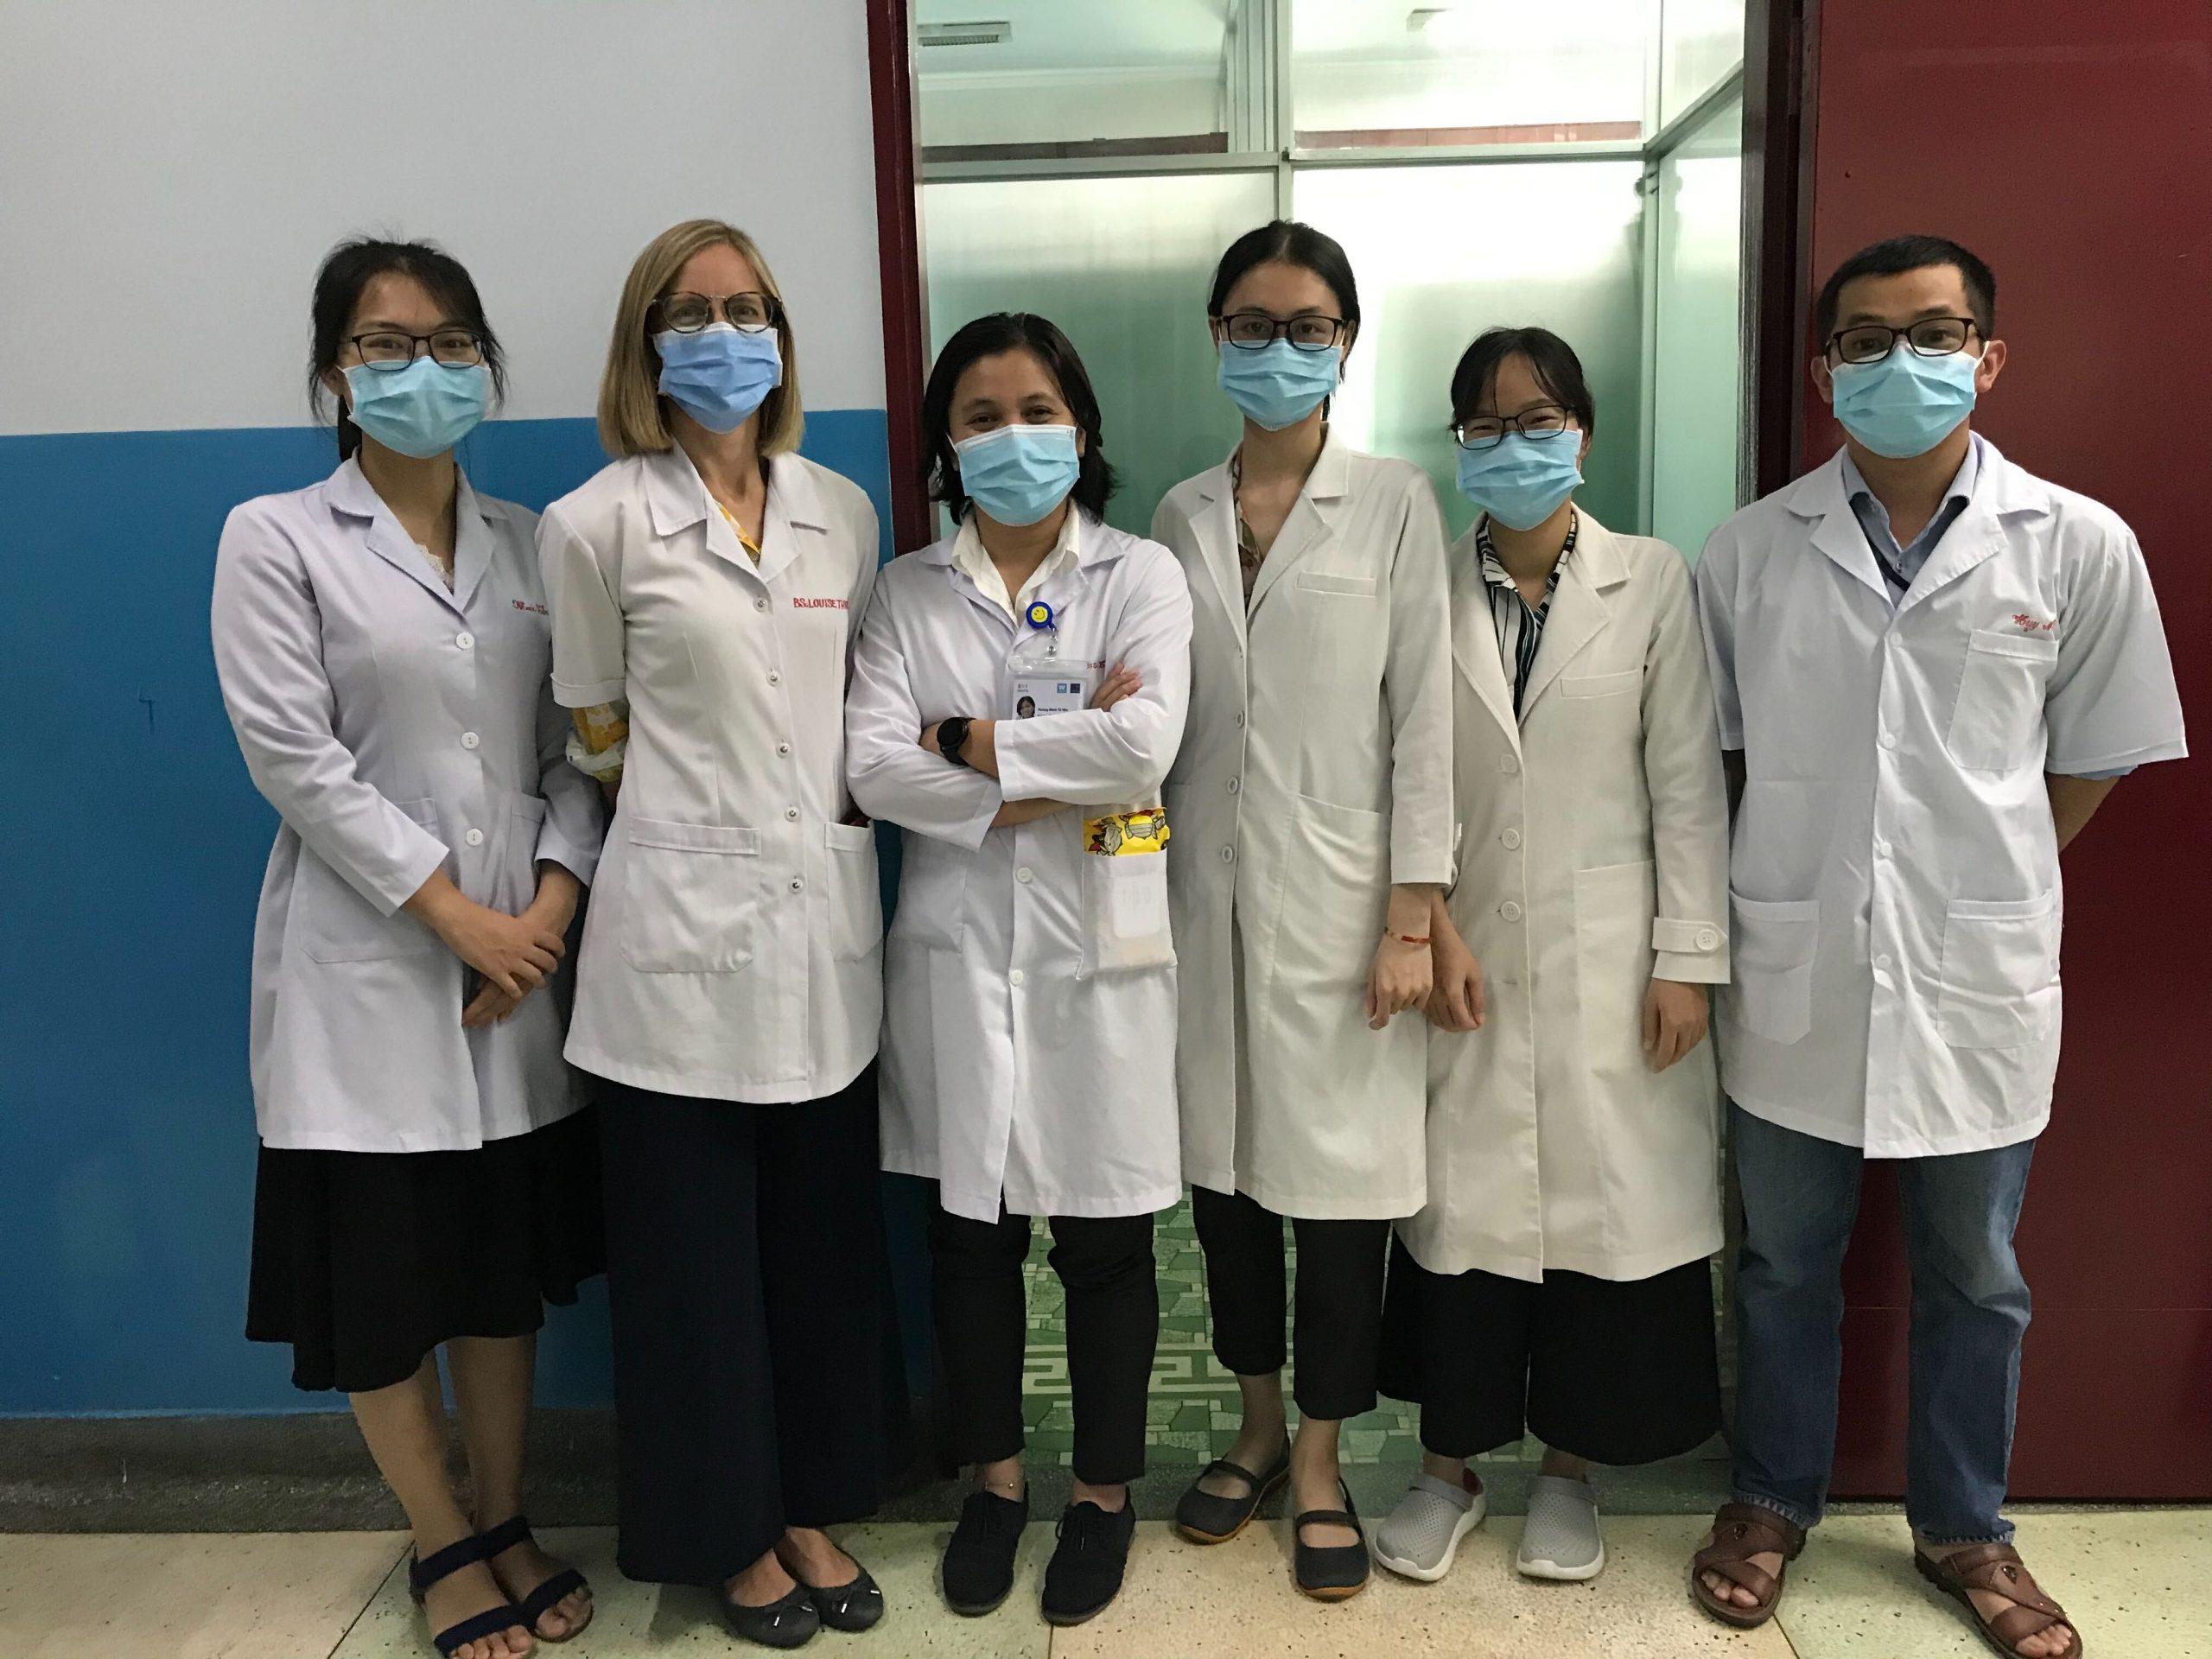 Welcoming new ultrasound team members